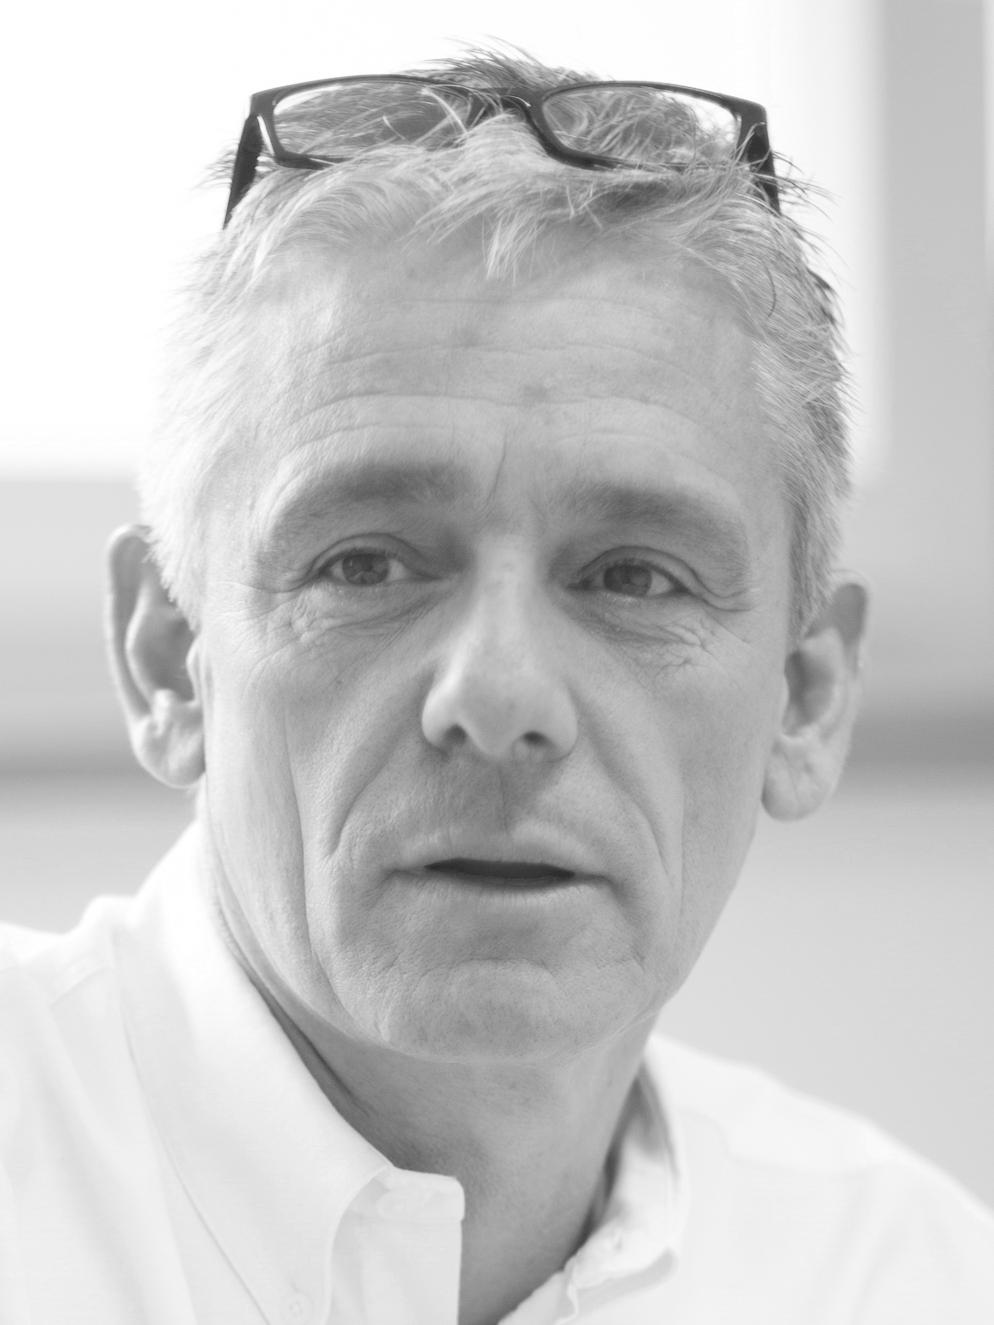 Pierre-Alain Gapany